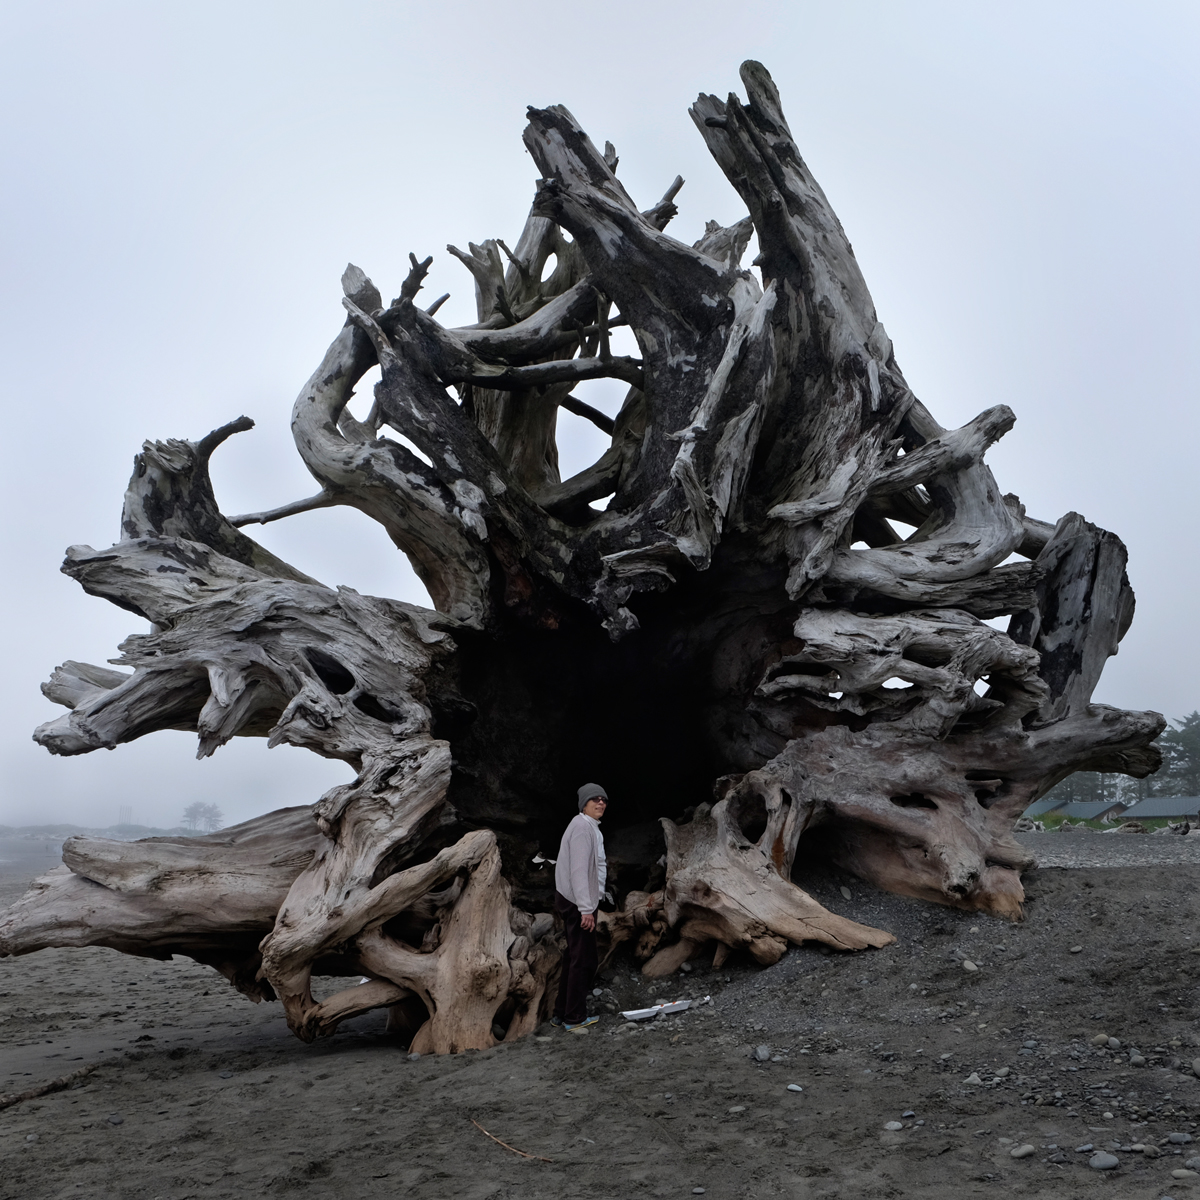 Leslie on the Beach at La Push, Washington, 2014  click image to enlarge